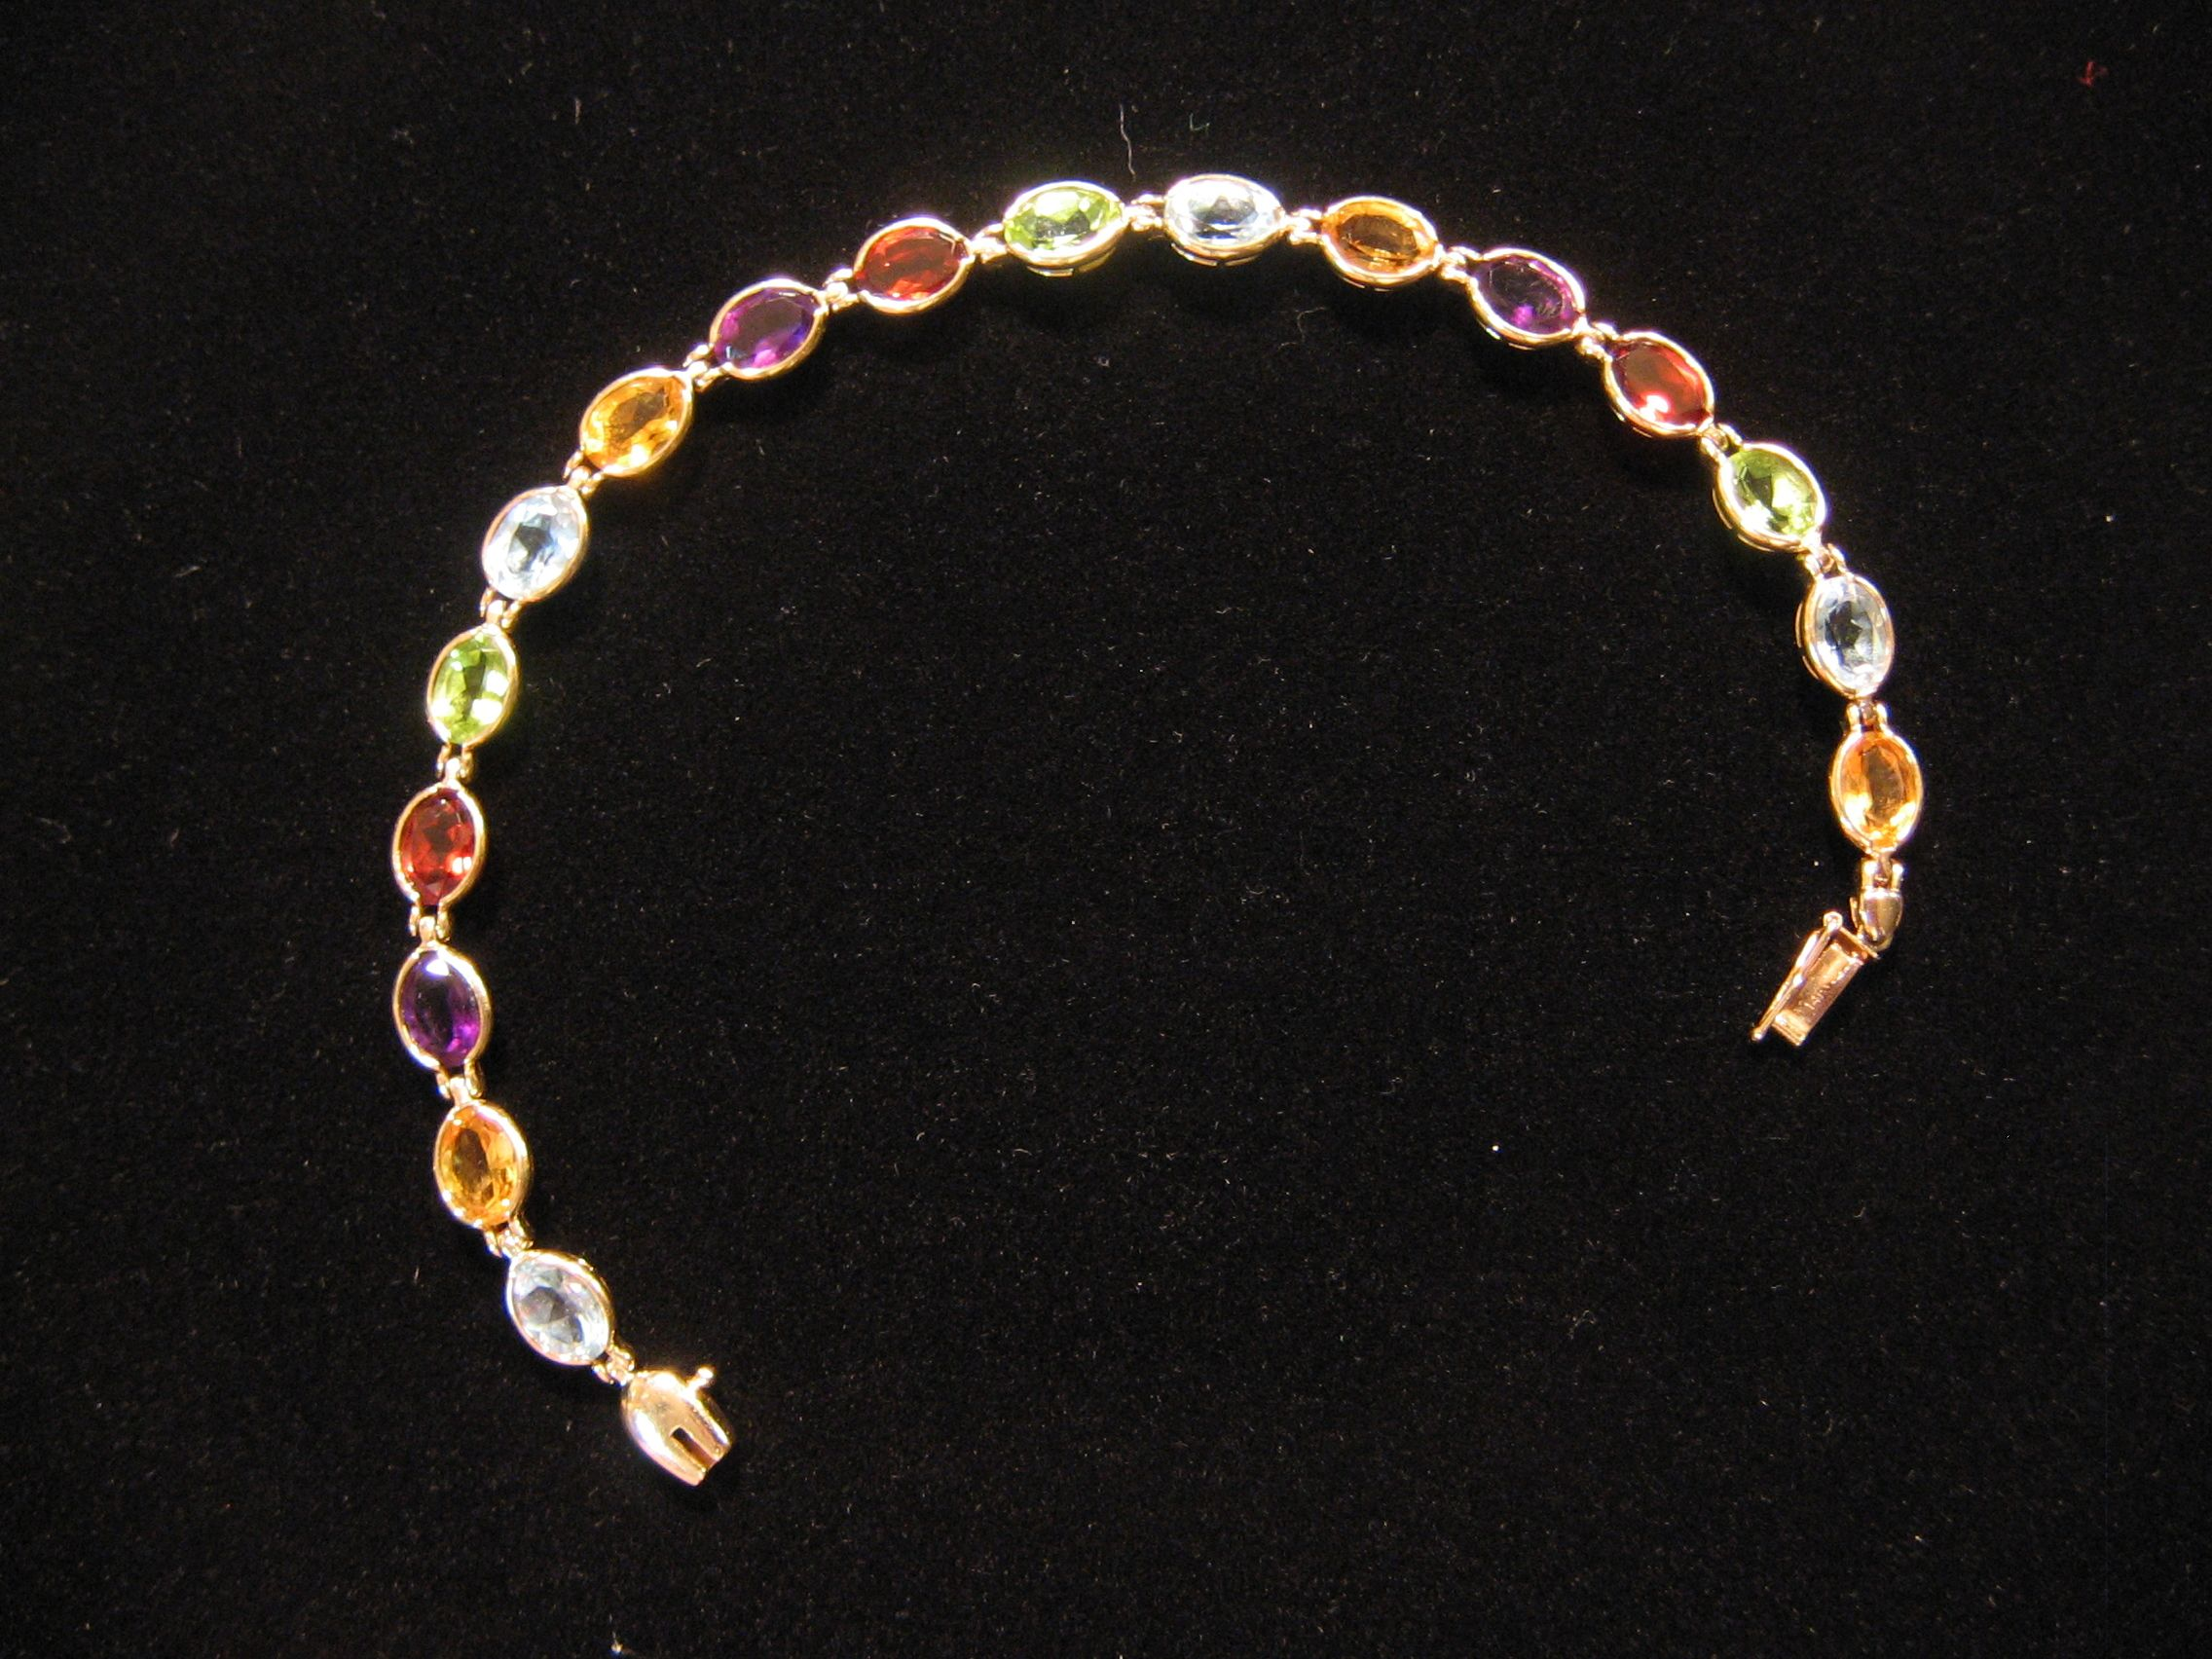 14kt. yellow Gold 7 1/2 inch gemstone bracelet JD3 Jewelry email: jd3metals@gmail.com *********phone:215-279-0606